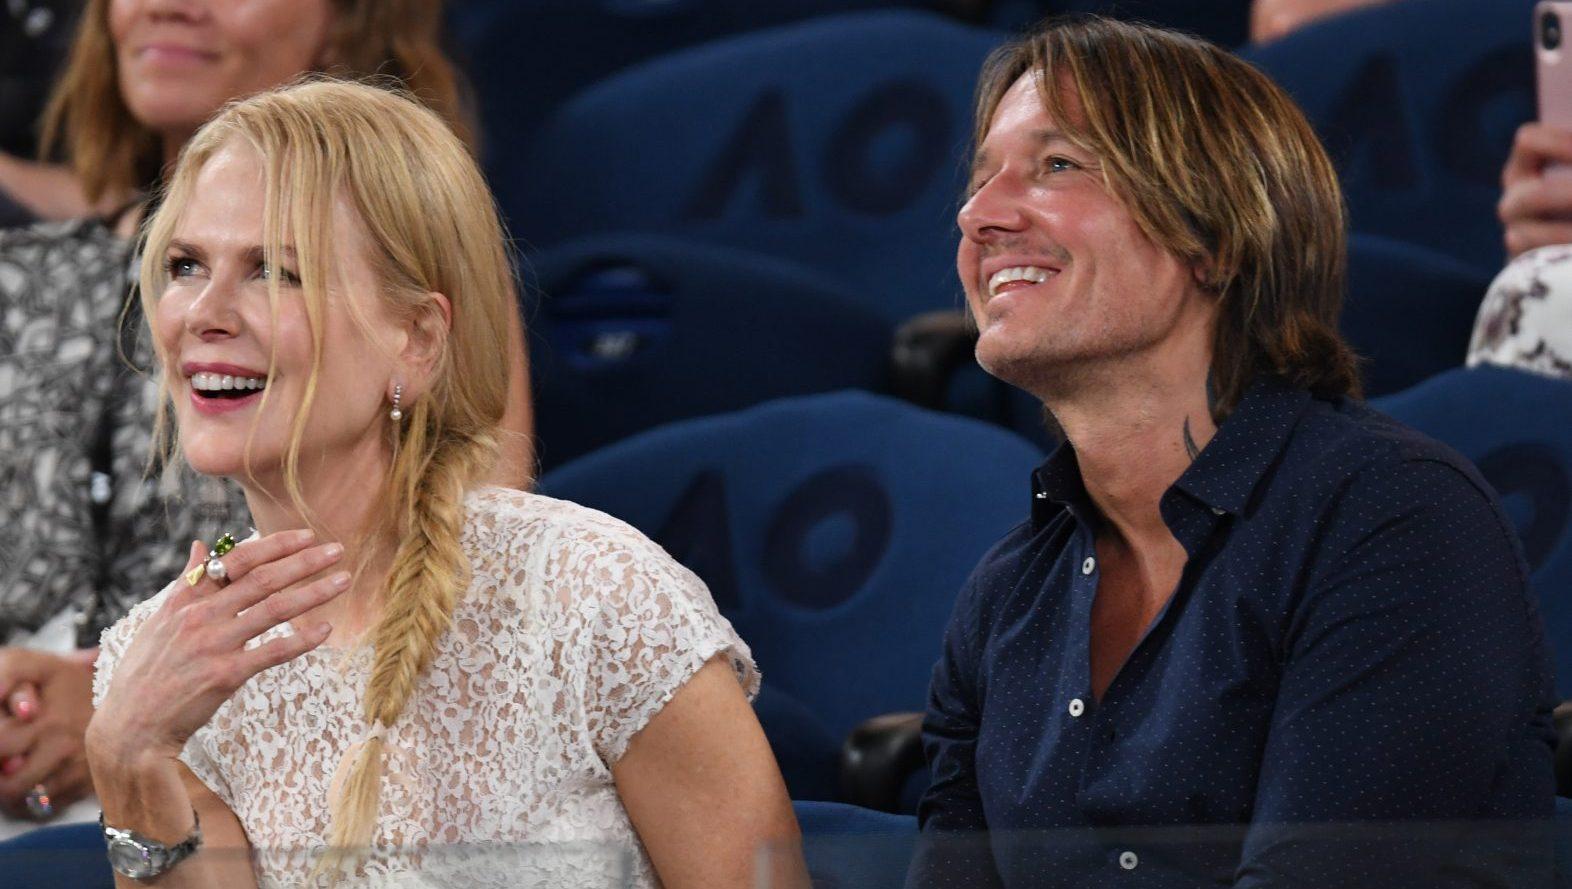 Nicole Kidman and Keith Urban watching the Australian Open